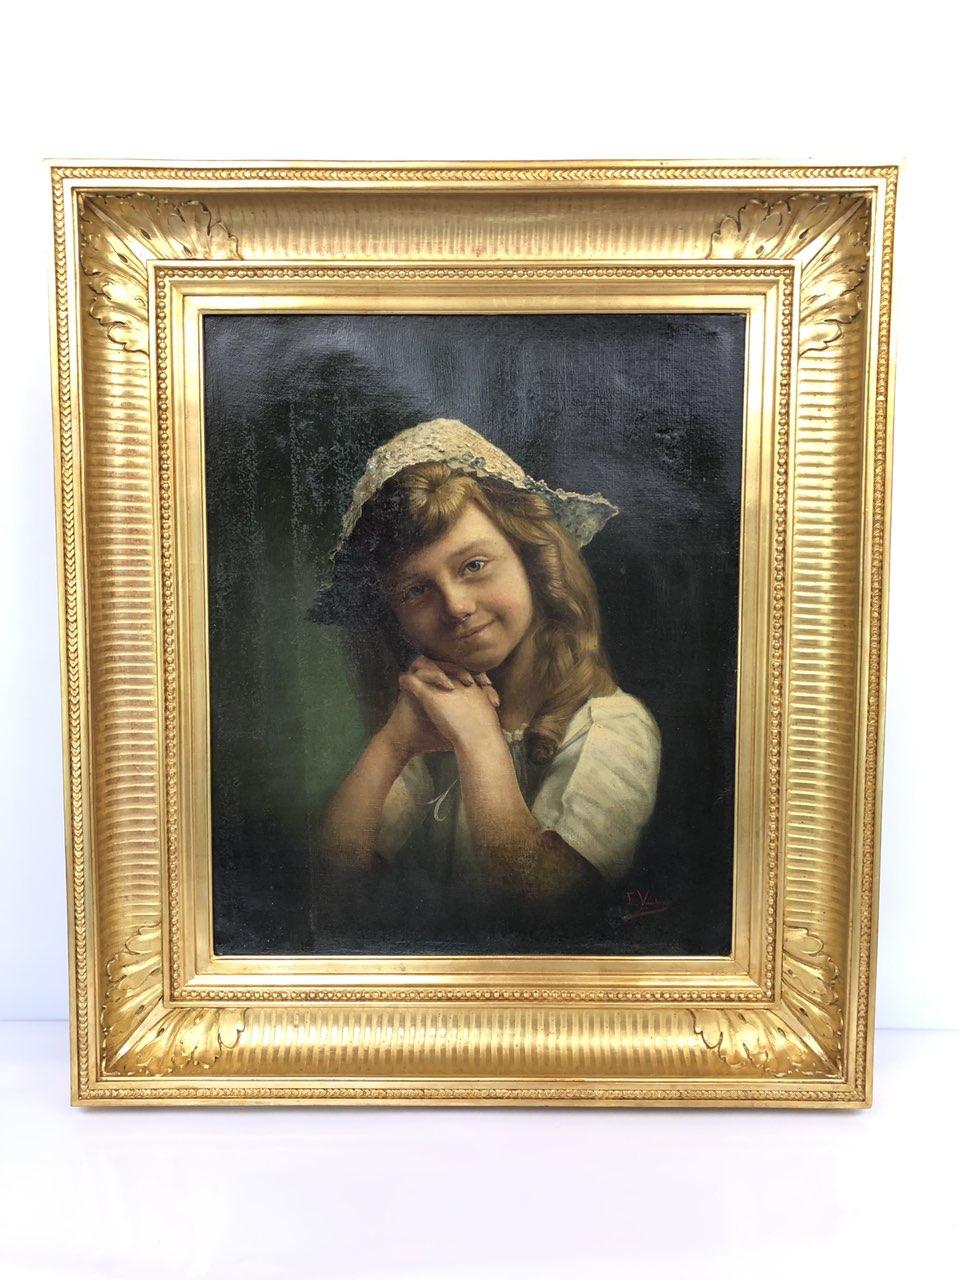 Антикварная живопись начала 20-го века